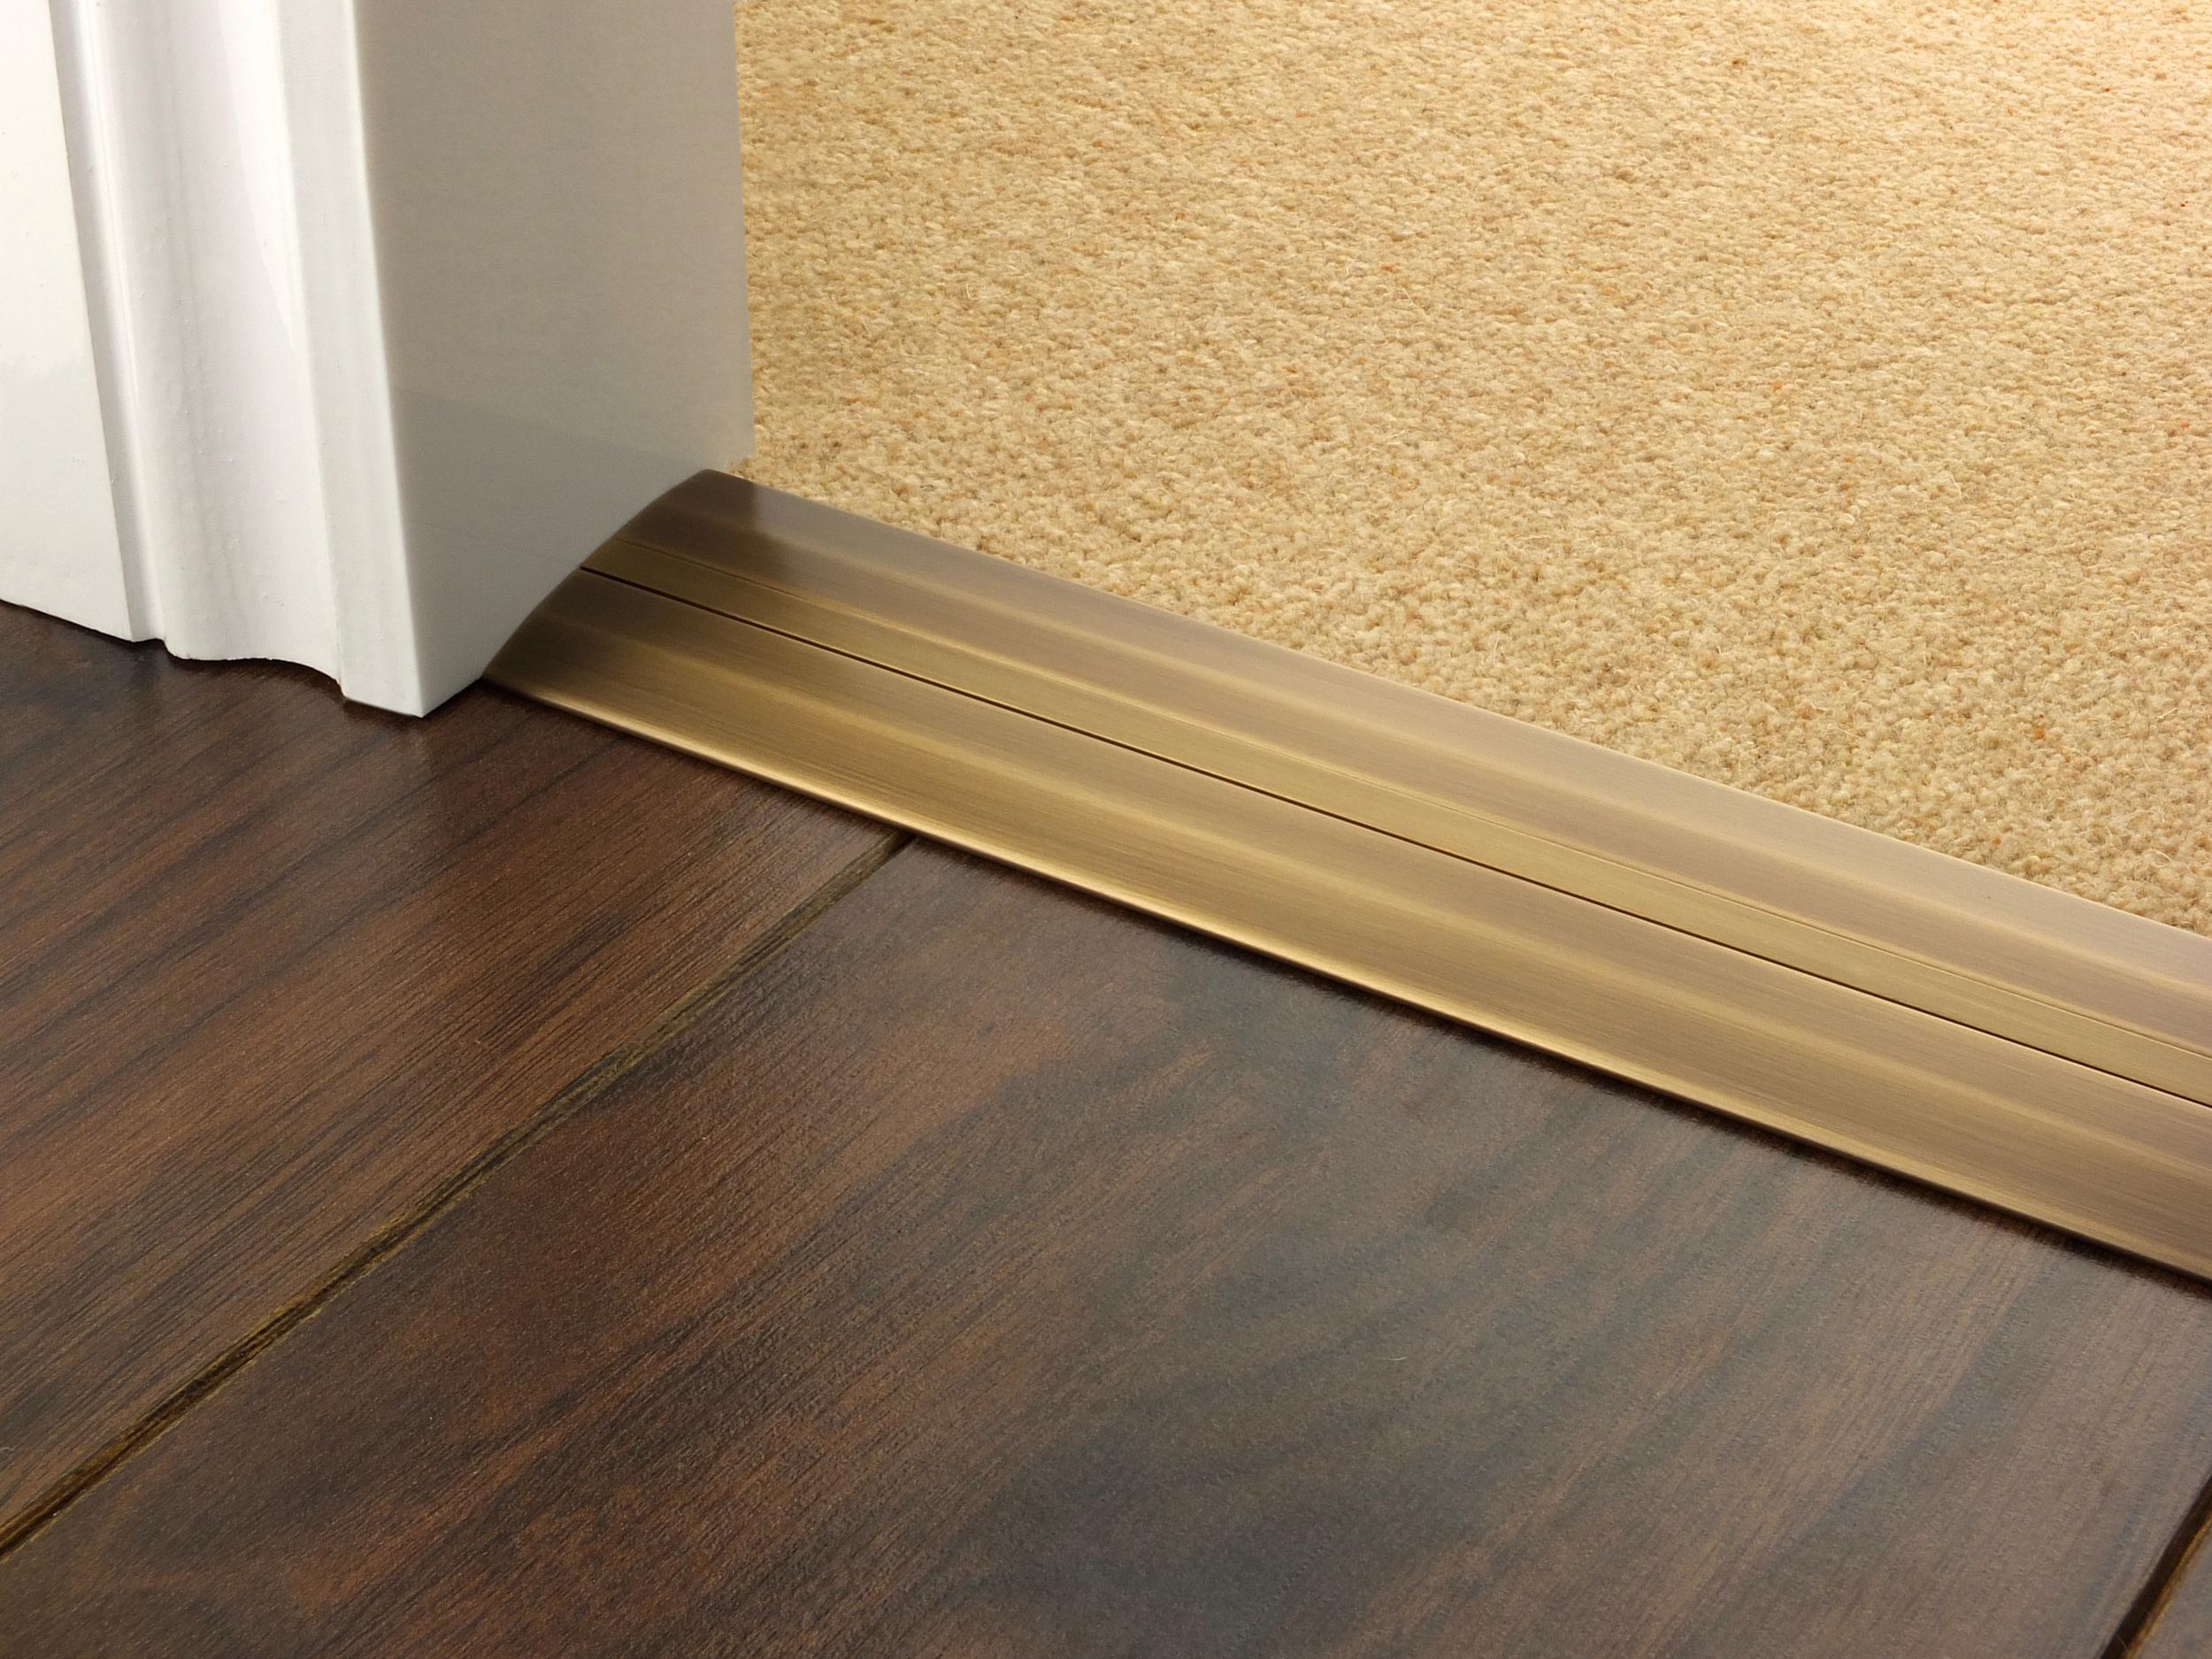 door_bar_antique_brass_posh_55_carpet_laminate.jpg